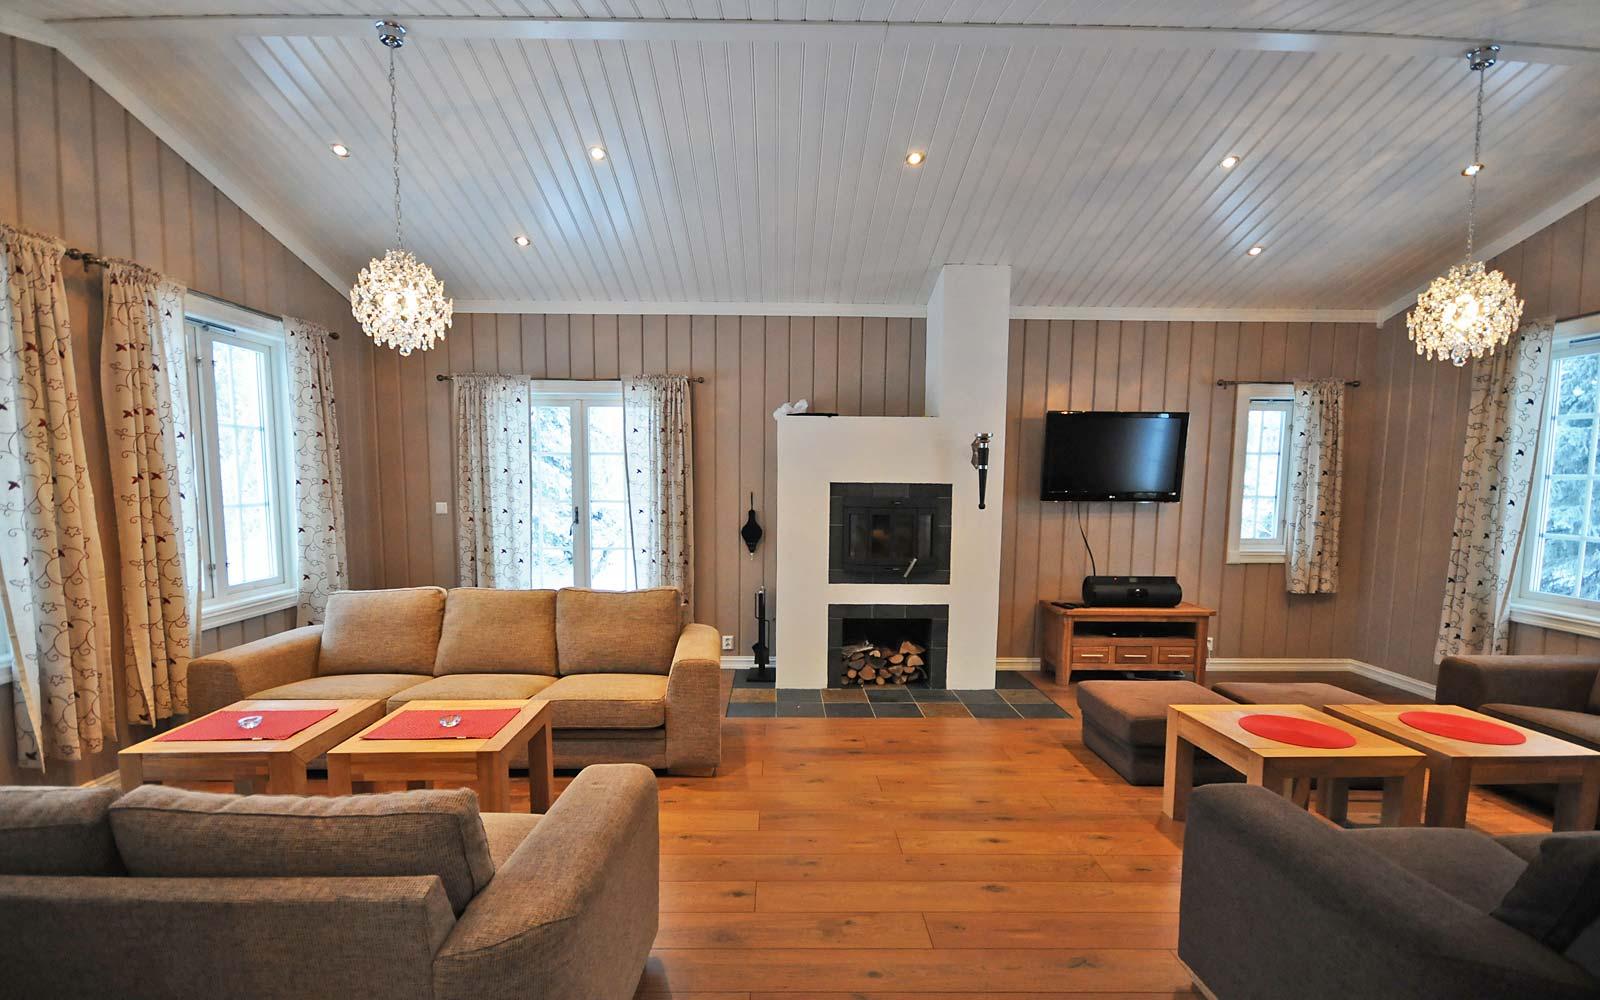 Stue Håvi-2 - Sjumilskogen booking Trysil